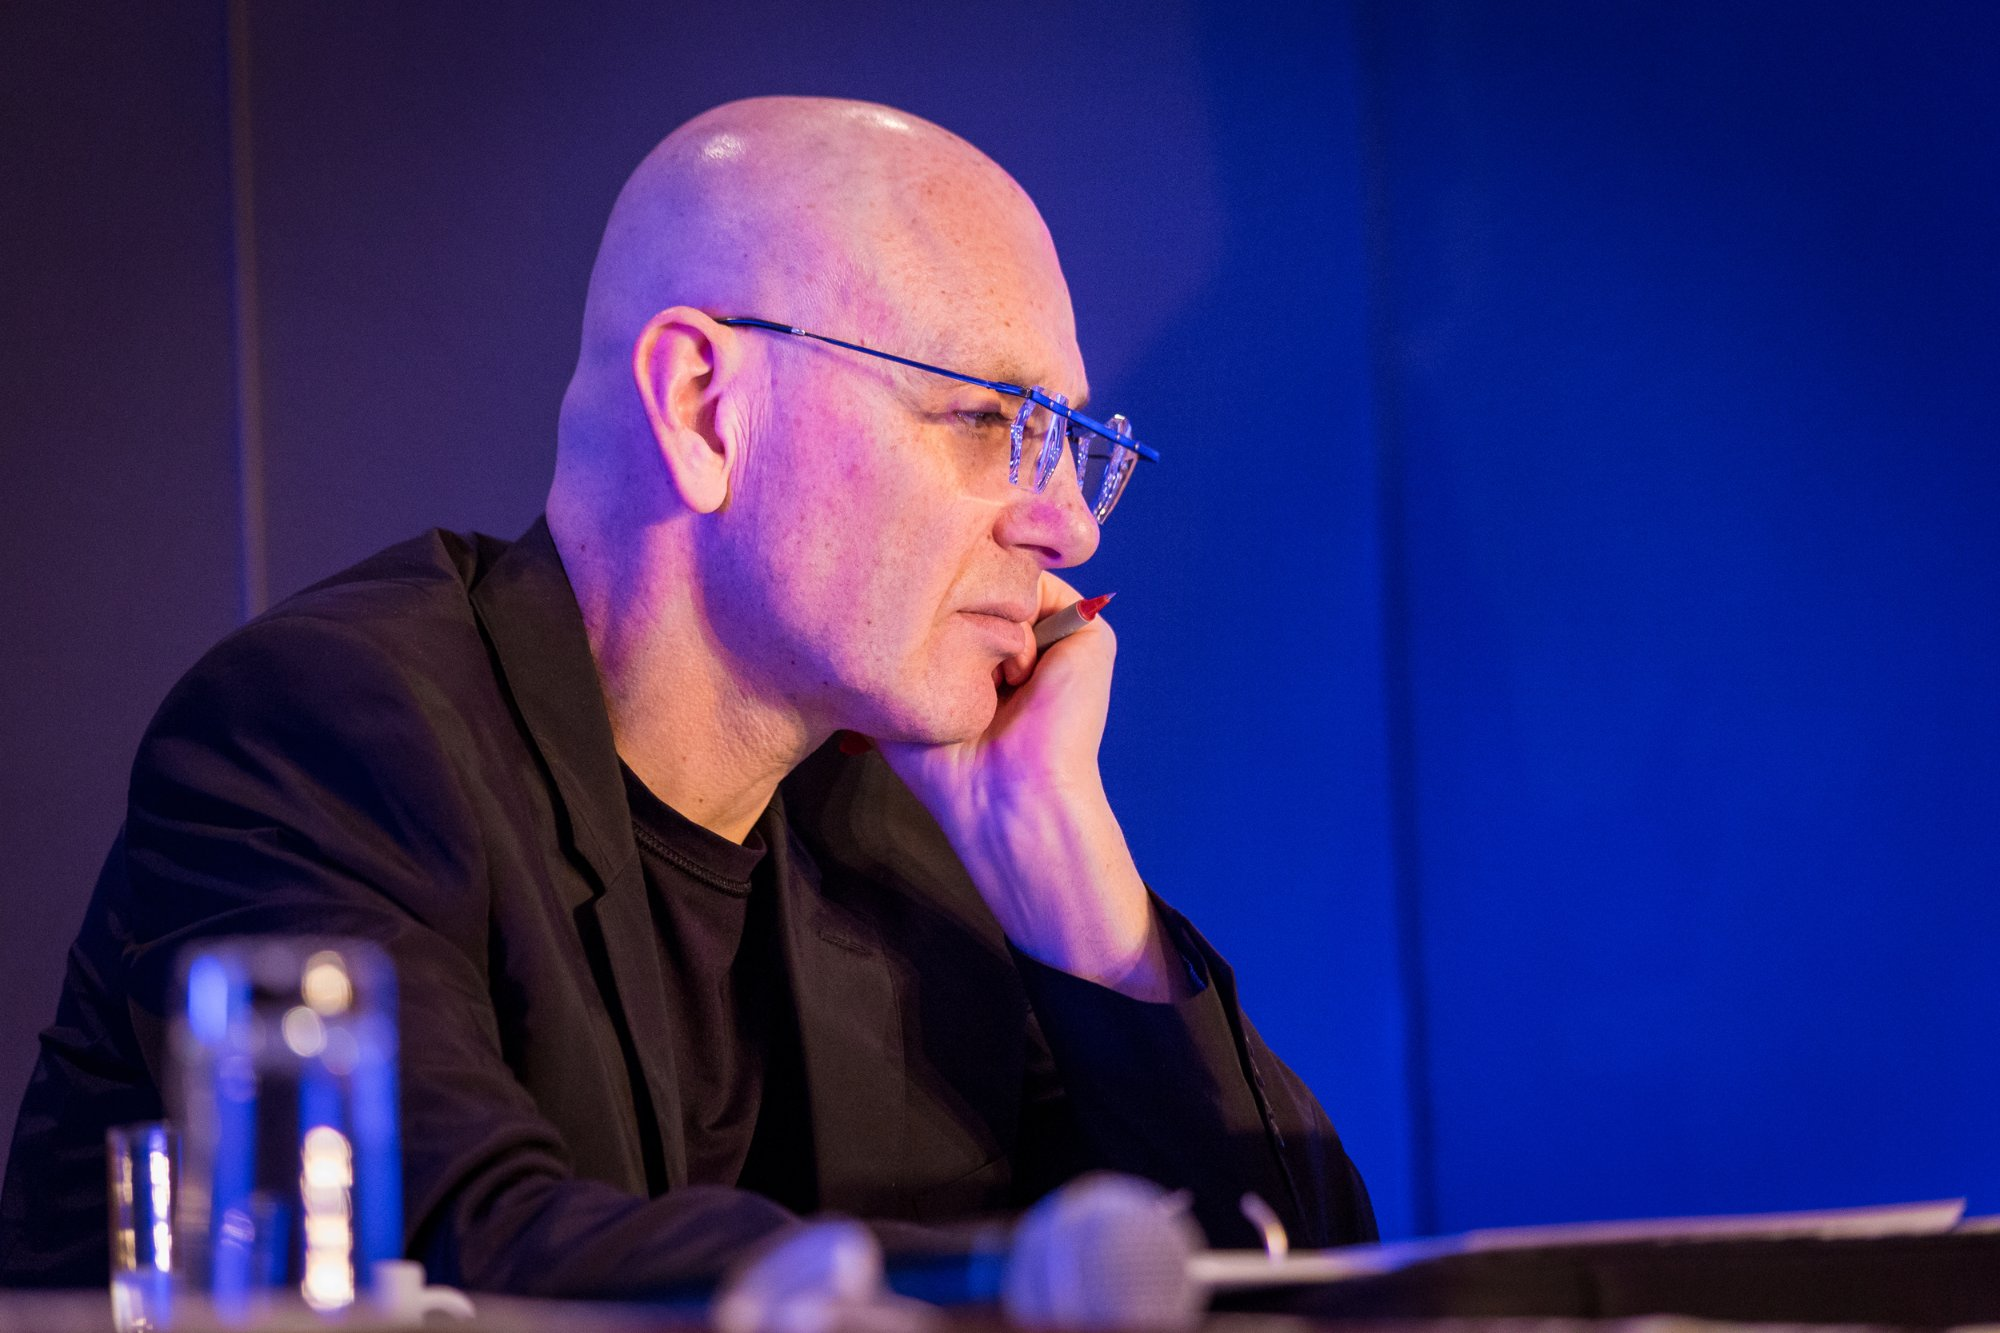 Michael Lebby: Photonics as enabler for Innovation